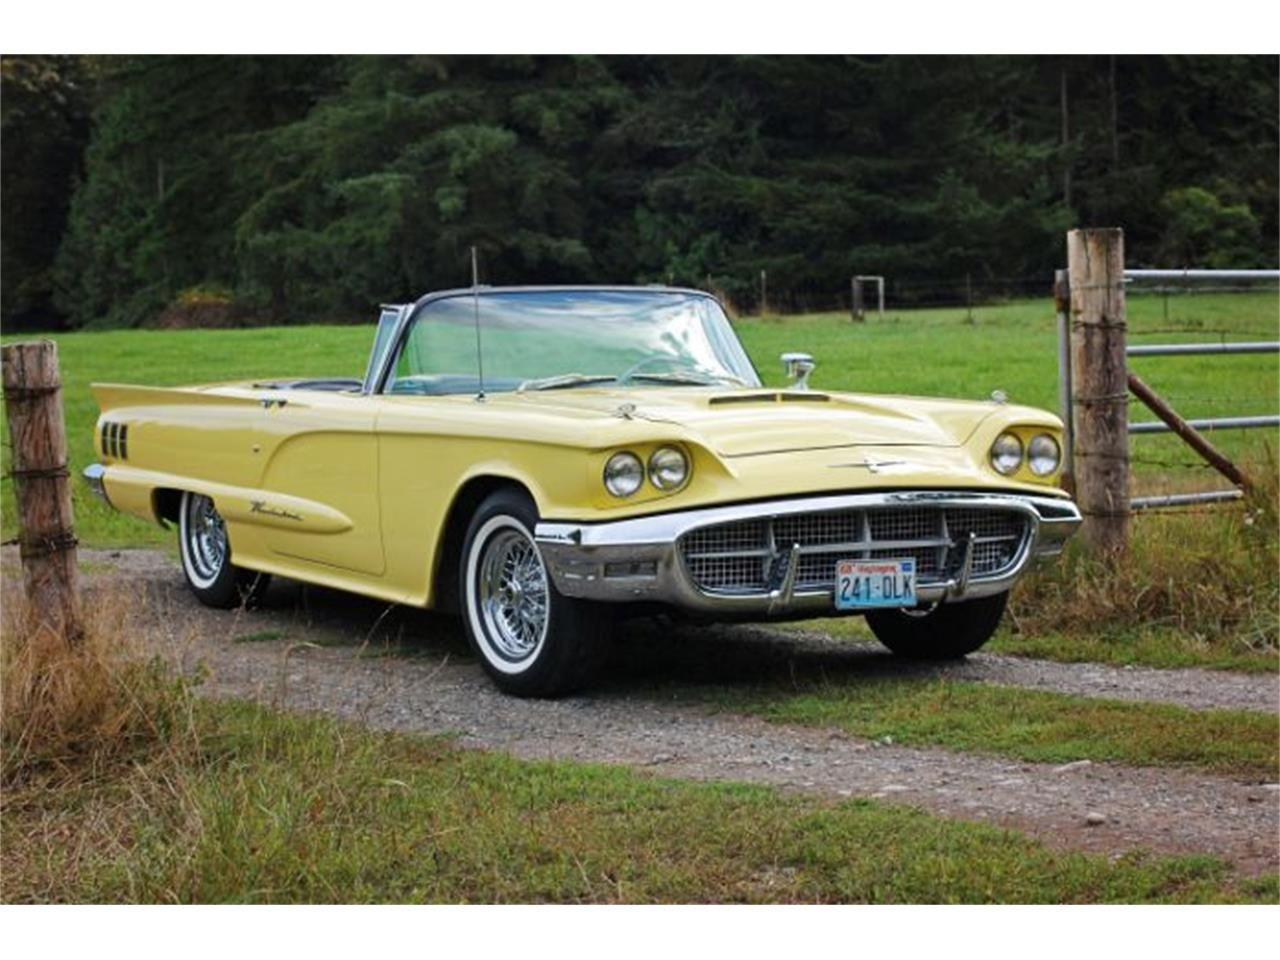 1960 Ford Thunderbird Ford Thunderbird Vehicles Ford Classic Cars